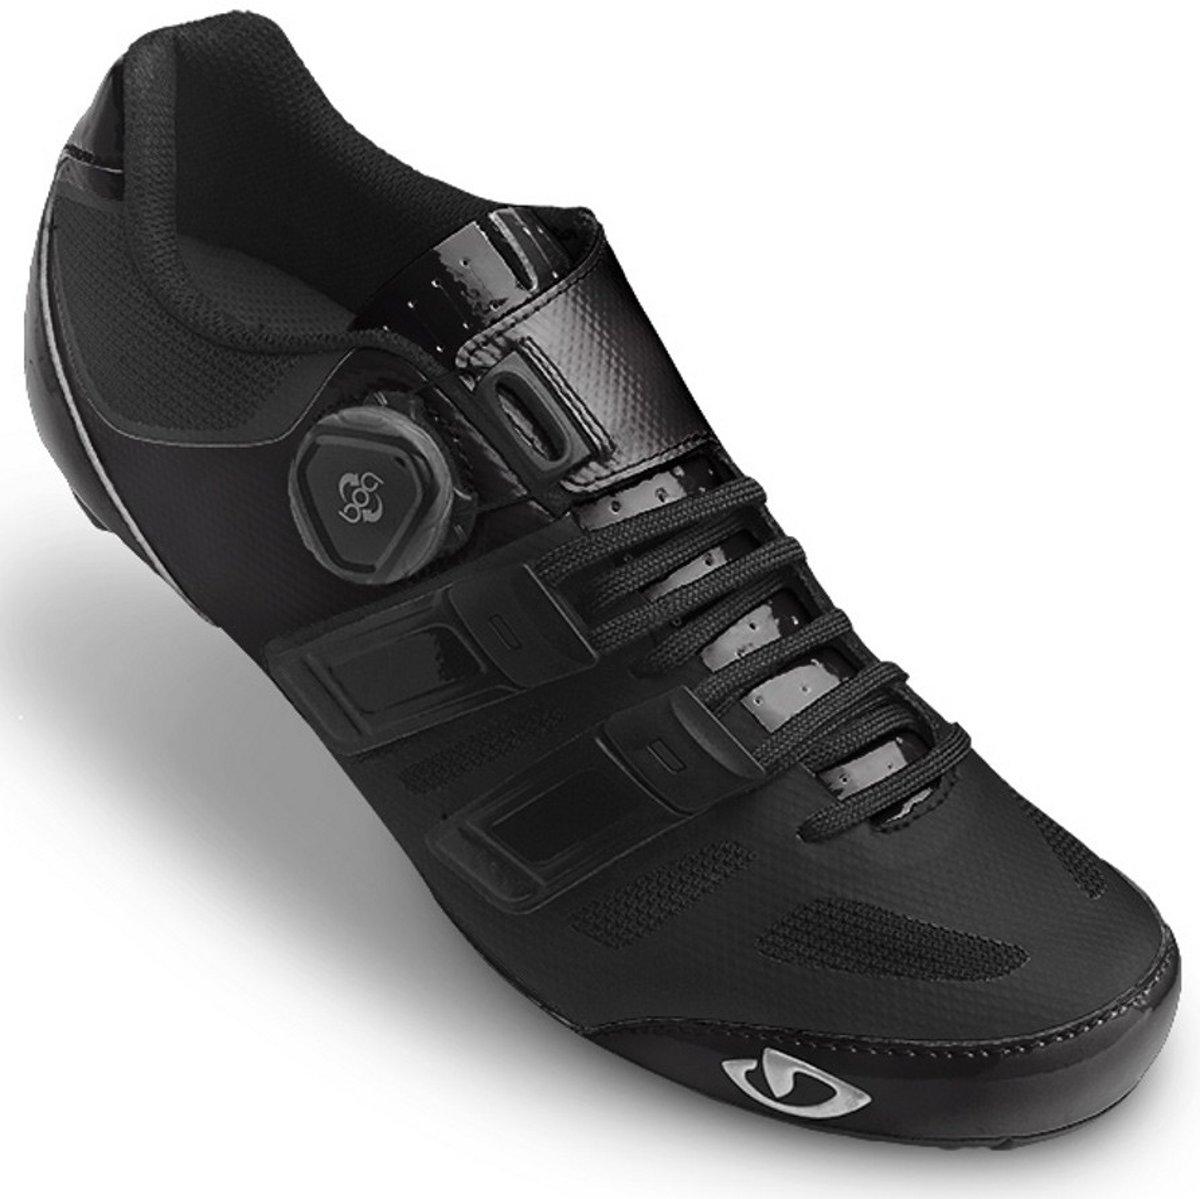 Giro Raes Techlace Schoenen Dames, black Schoenmaat EU 38